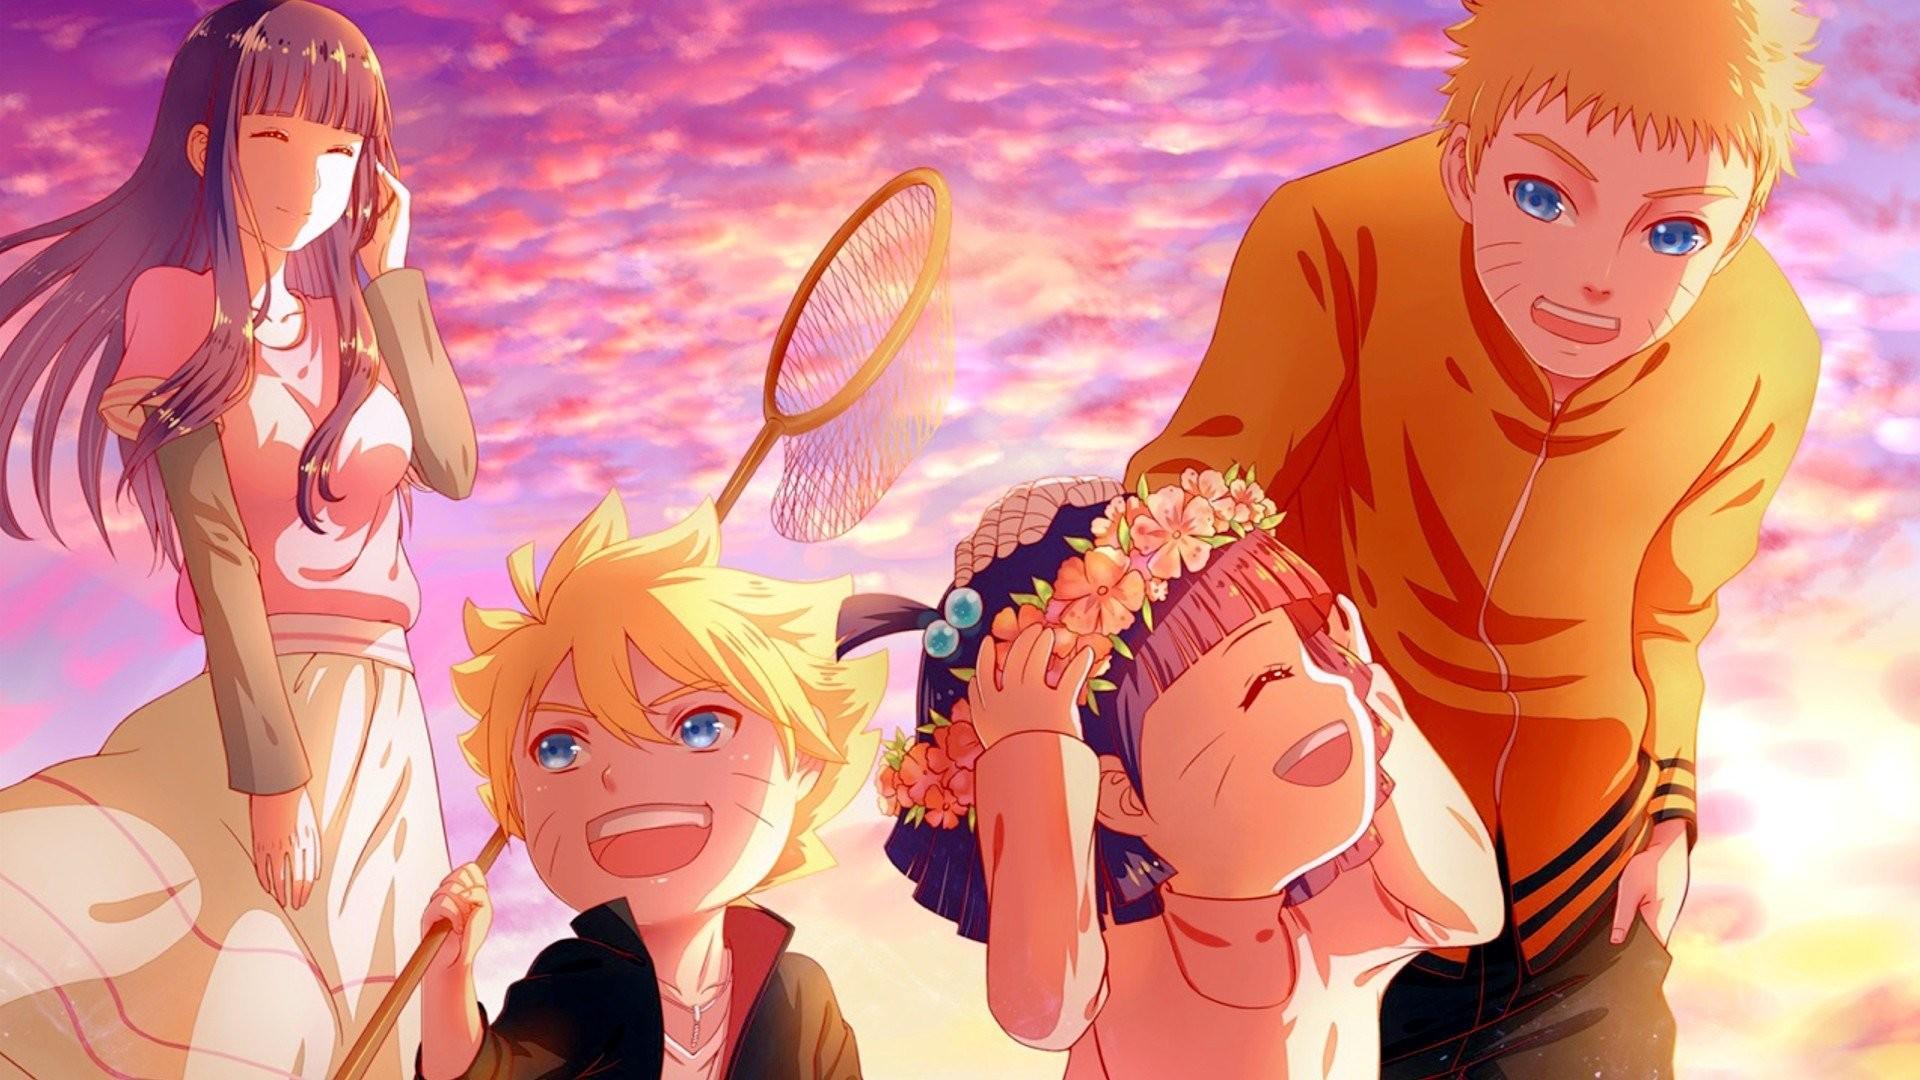 Naruto And Hinata Hd Wallpaper Descargar Hd Imagenes Naruto Para Dibujar Sasuke Nino De Las Resoluciones De Pantalla Anteriores Para Hd Widescreen 4k